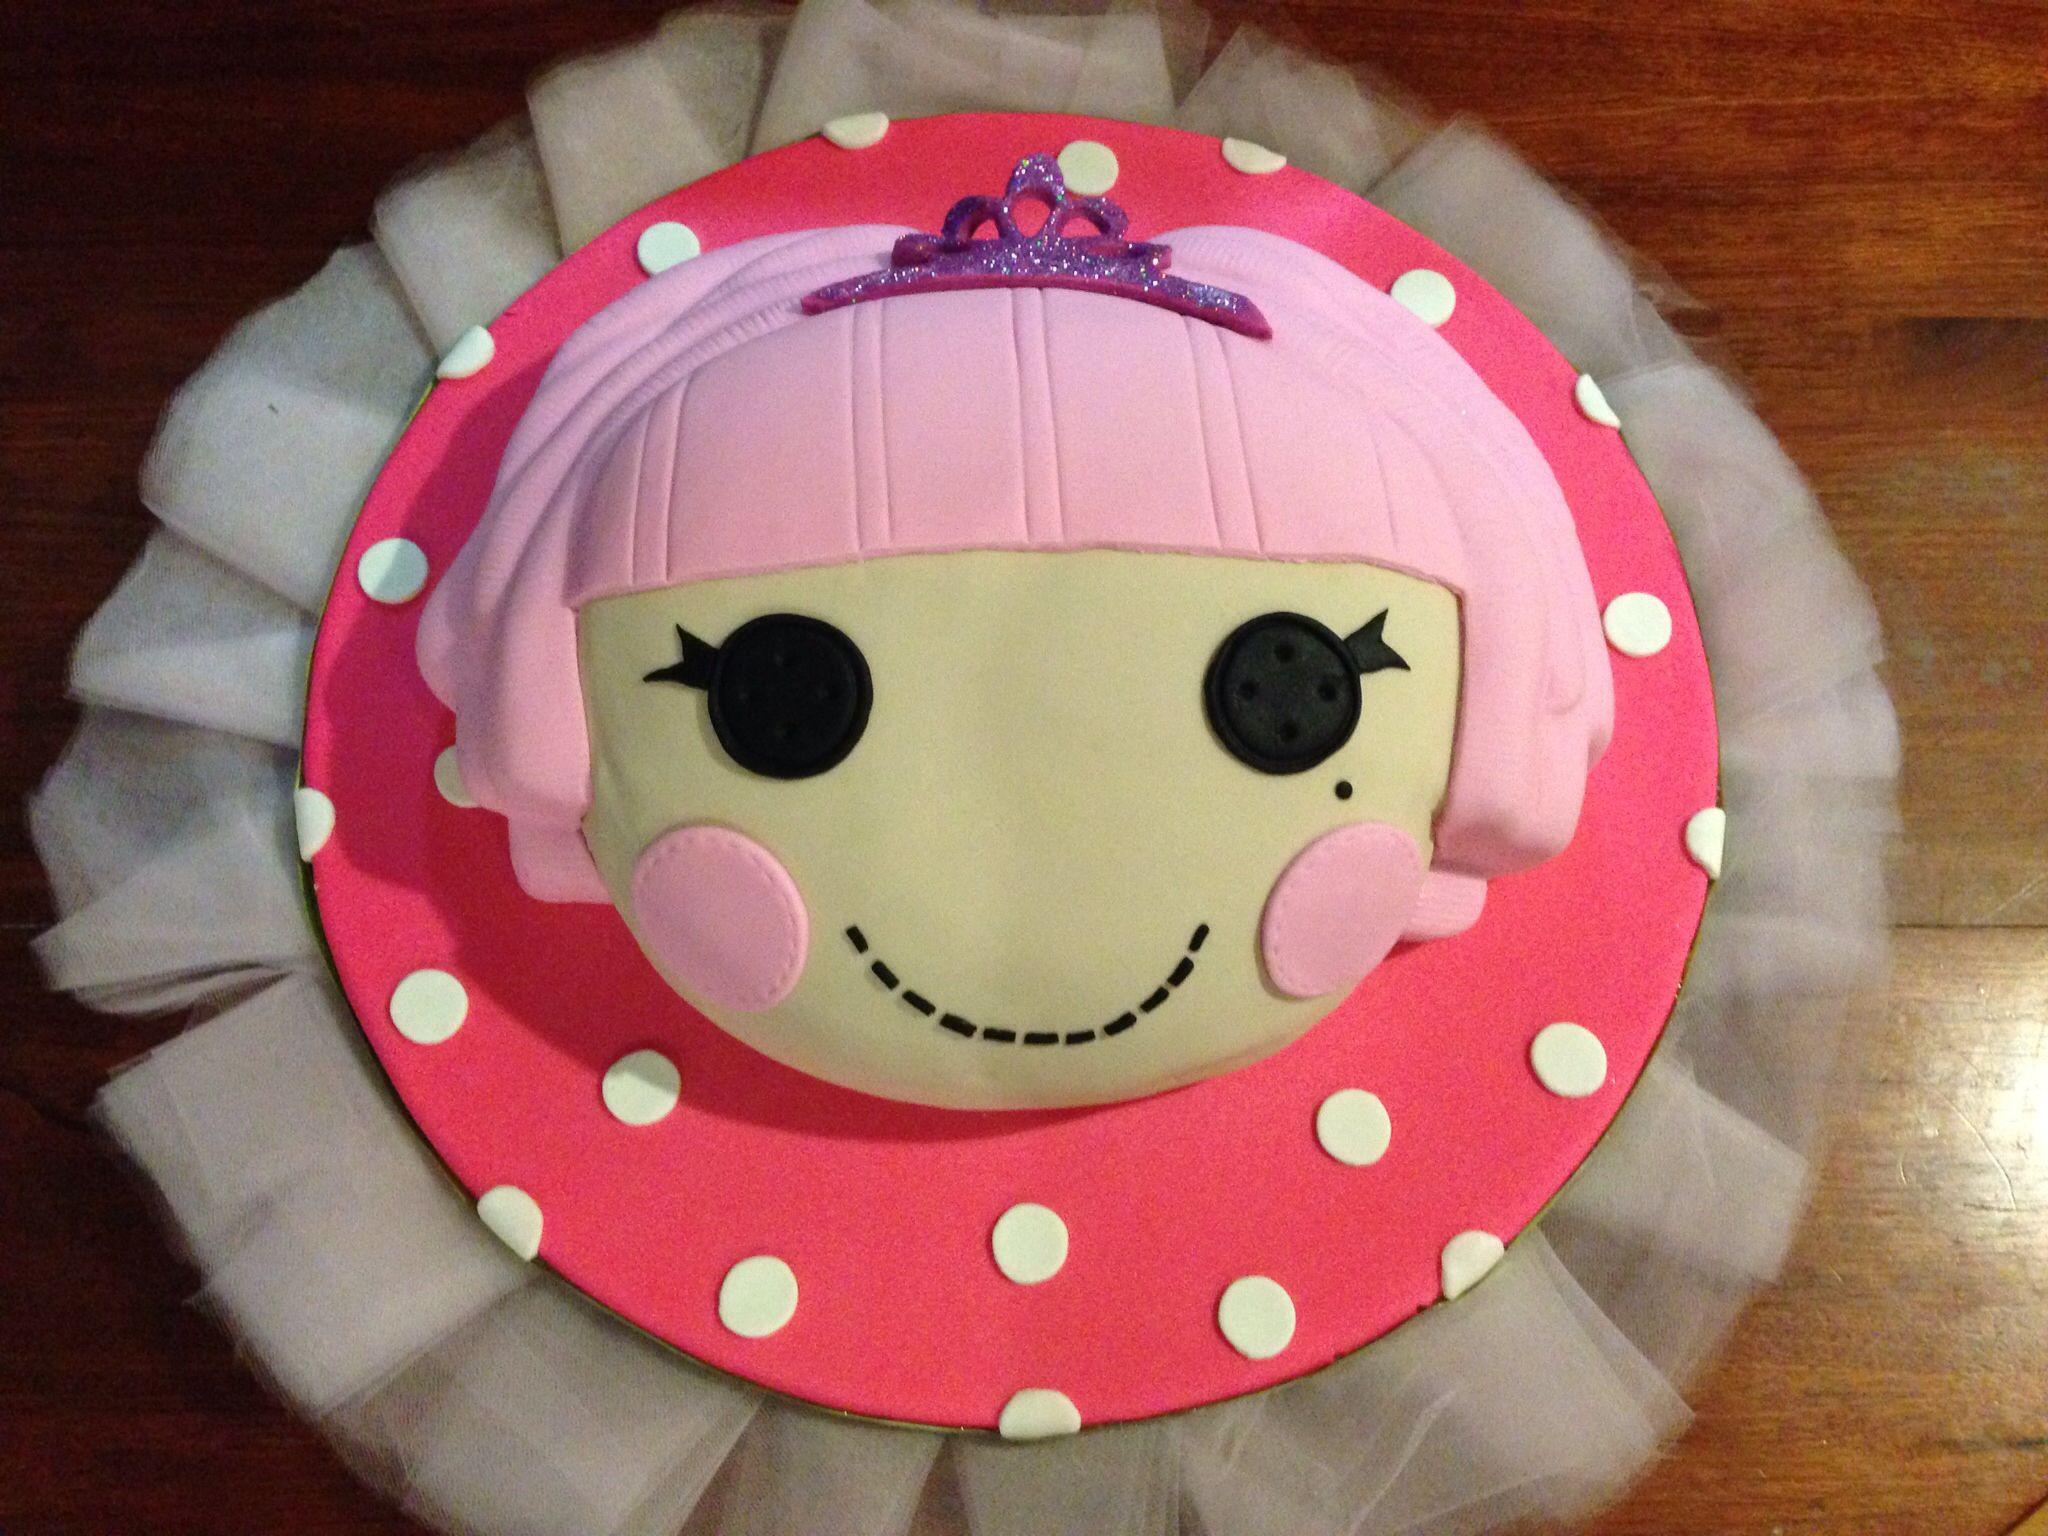 Lalaloopsy Jewel Sparkles Cake